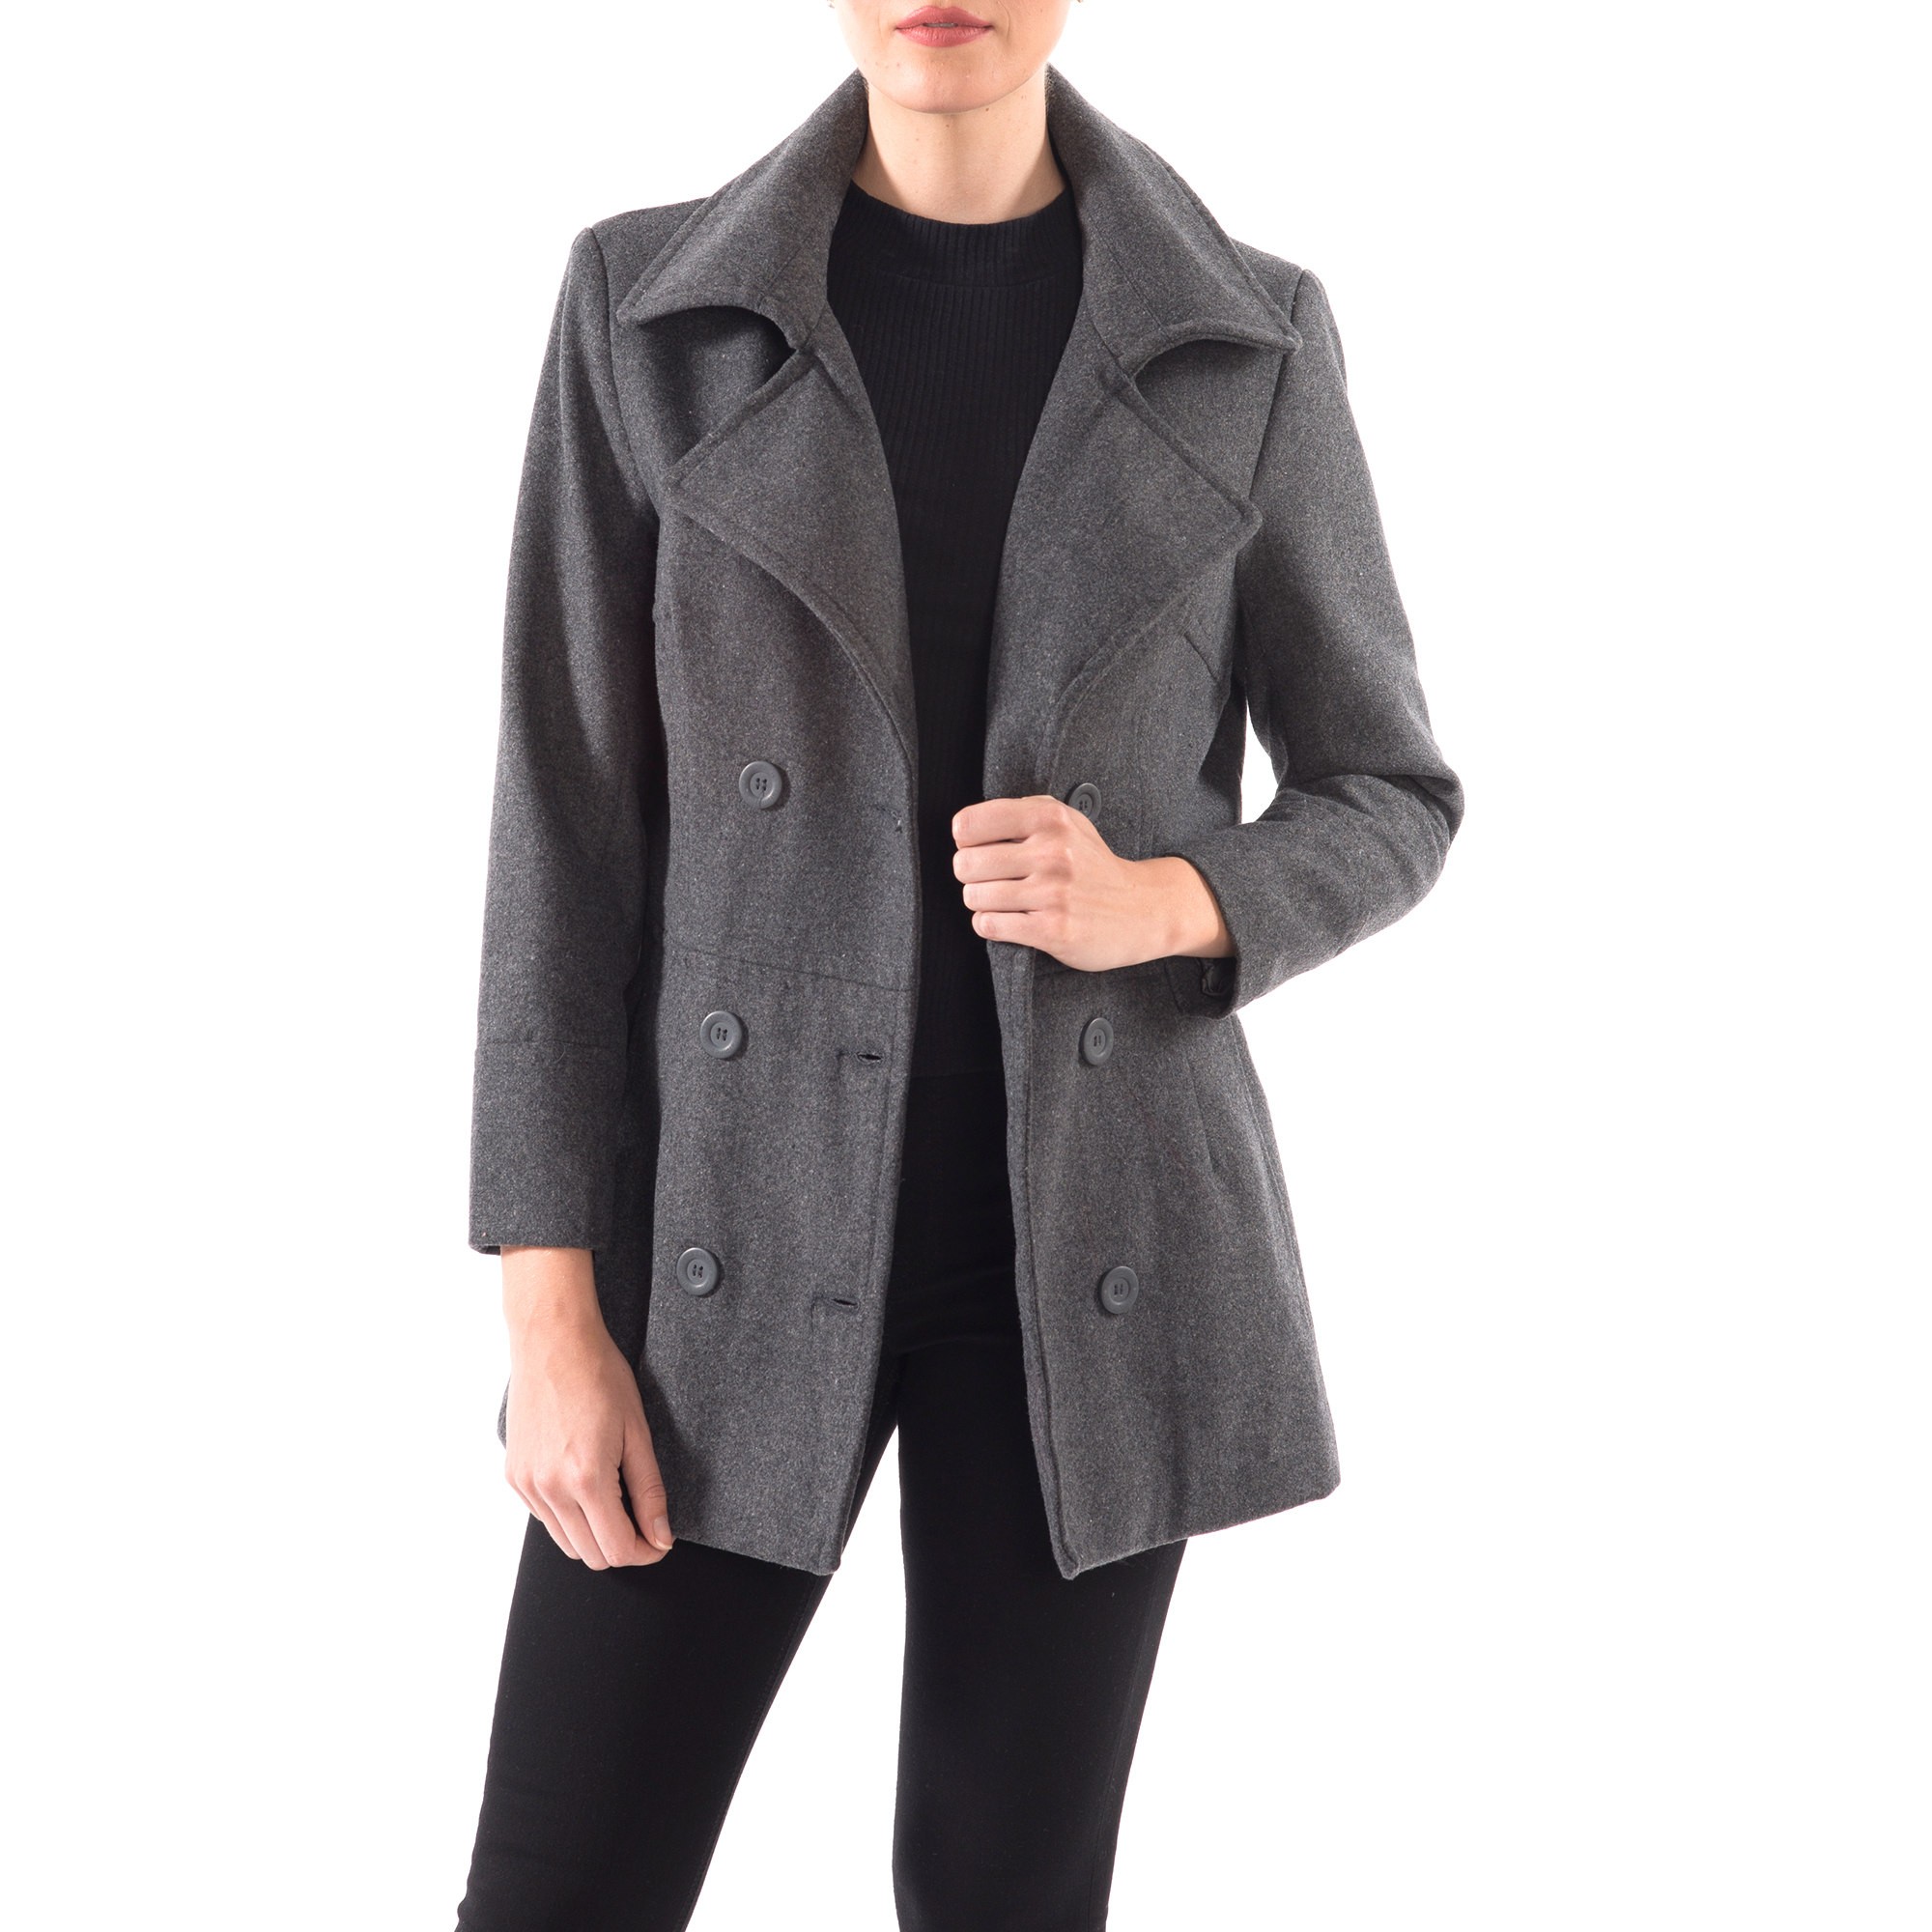 Alpine-Swiss-Emma-Womens-Peacoat-Jacket-Wool-Blazer-Double-Breasted-Overcoat-New thumbnail 39